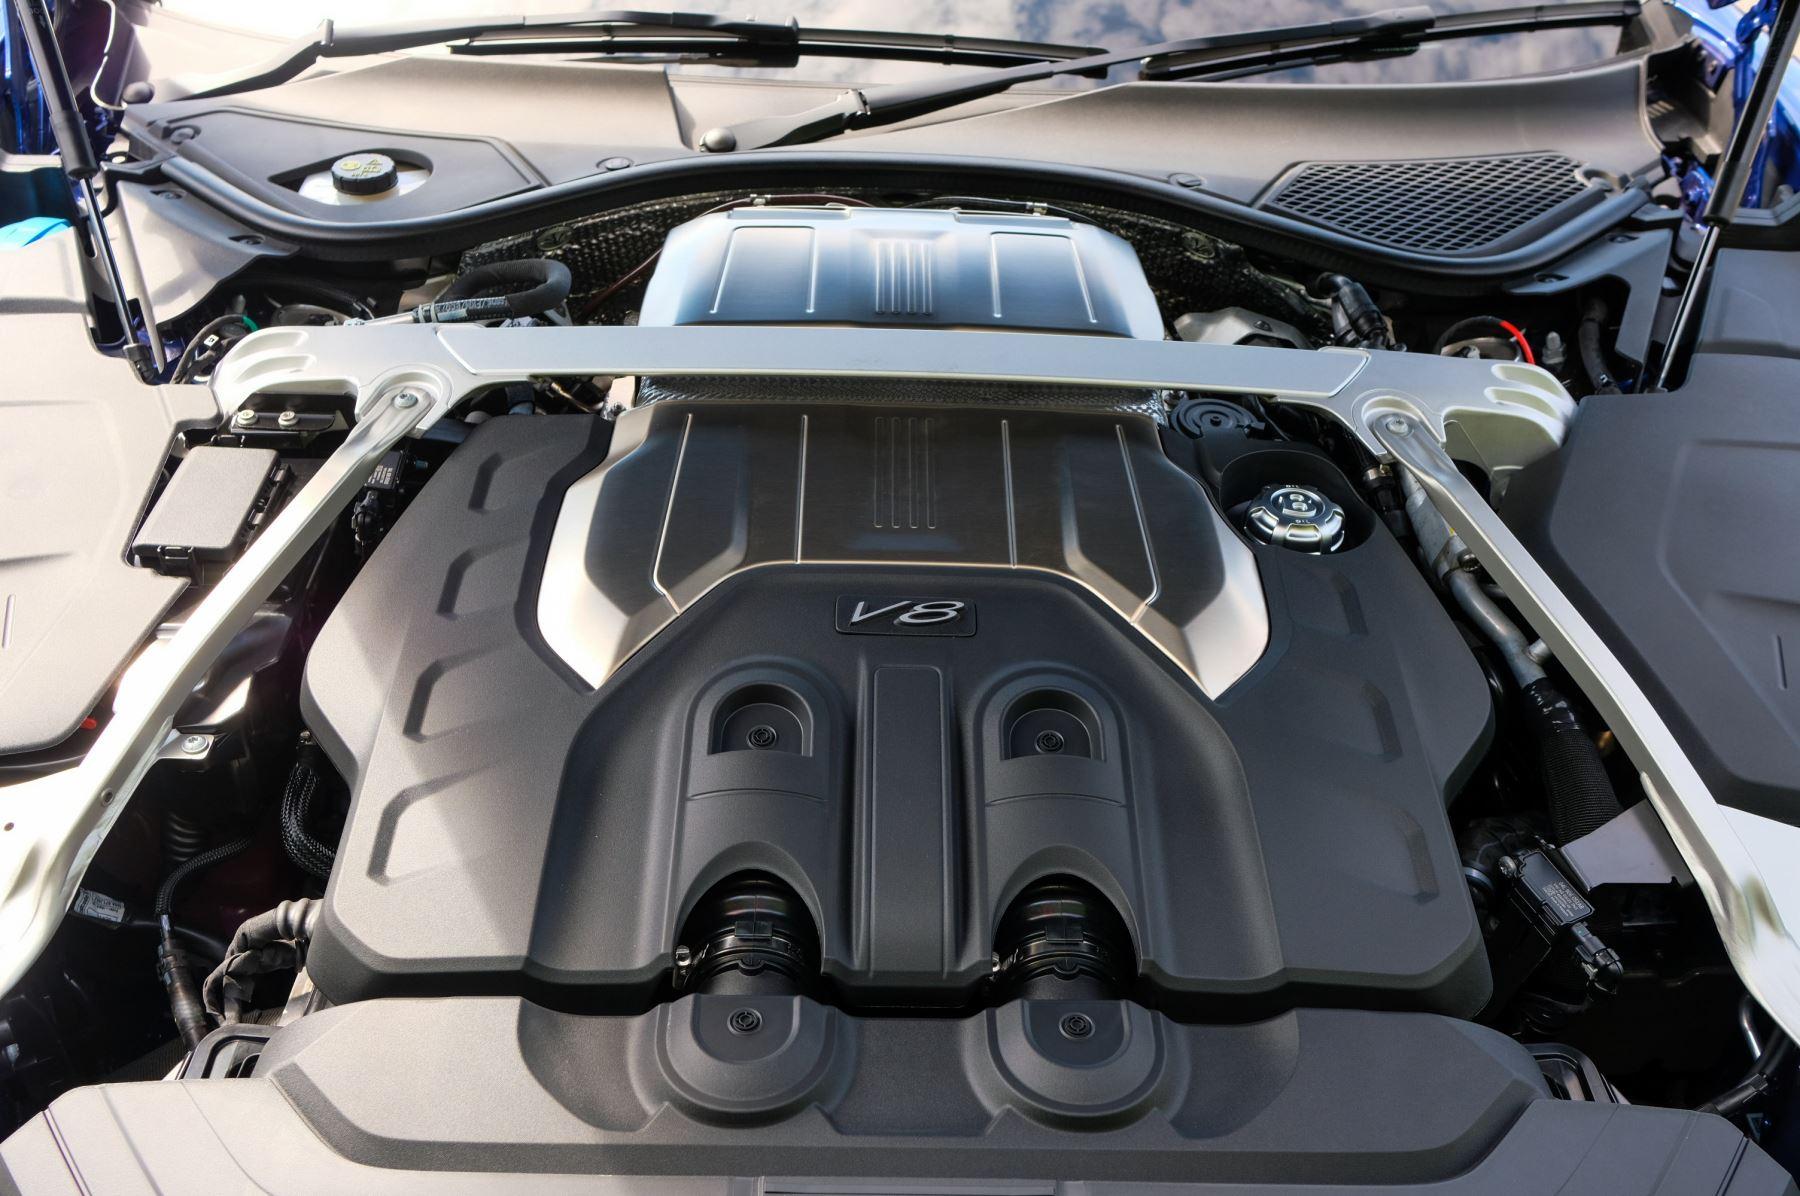 Bentley Continental GTC 4.0 V8 Mulliner Edition 2dr Auto [Tour Spec] image 9